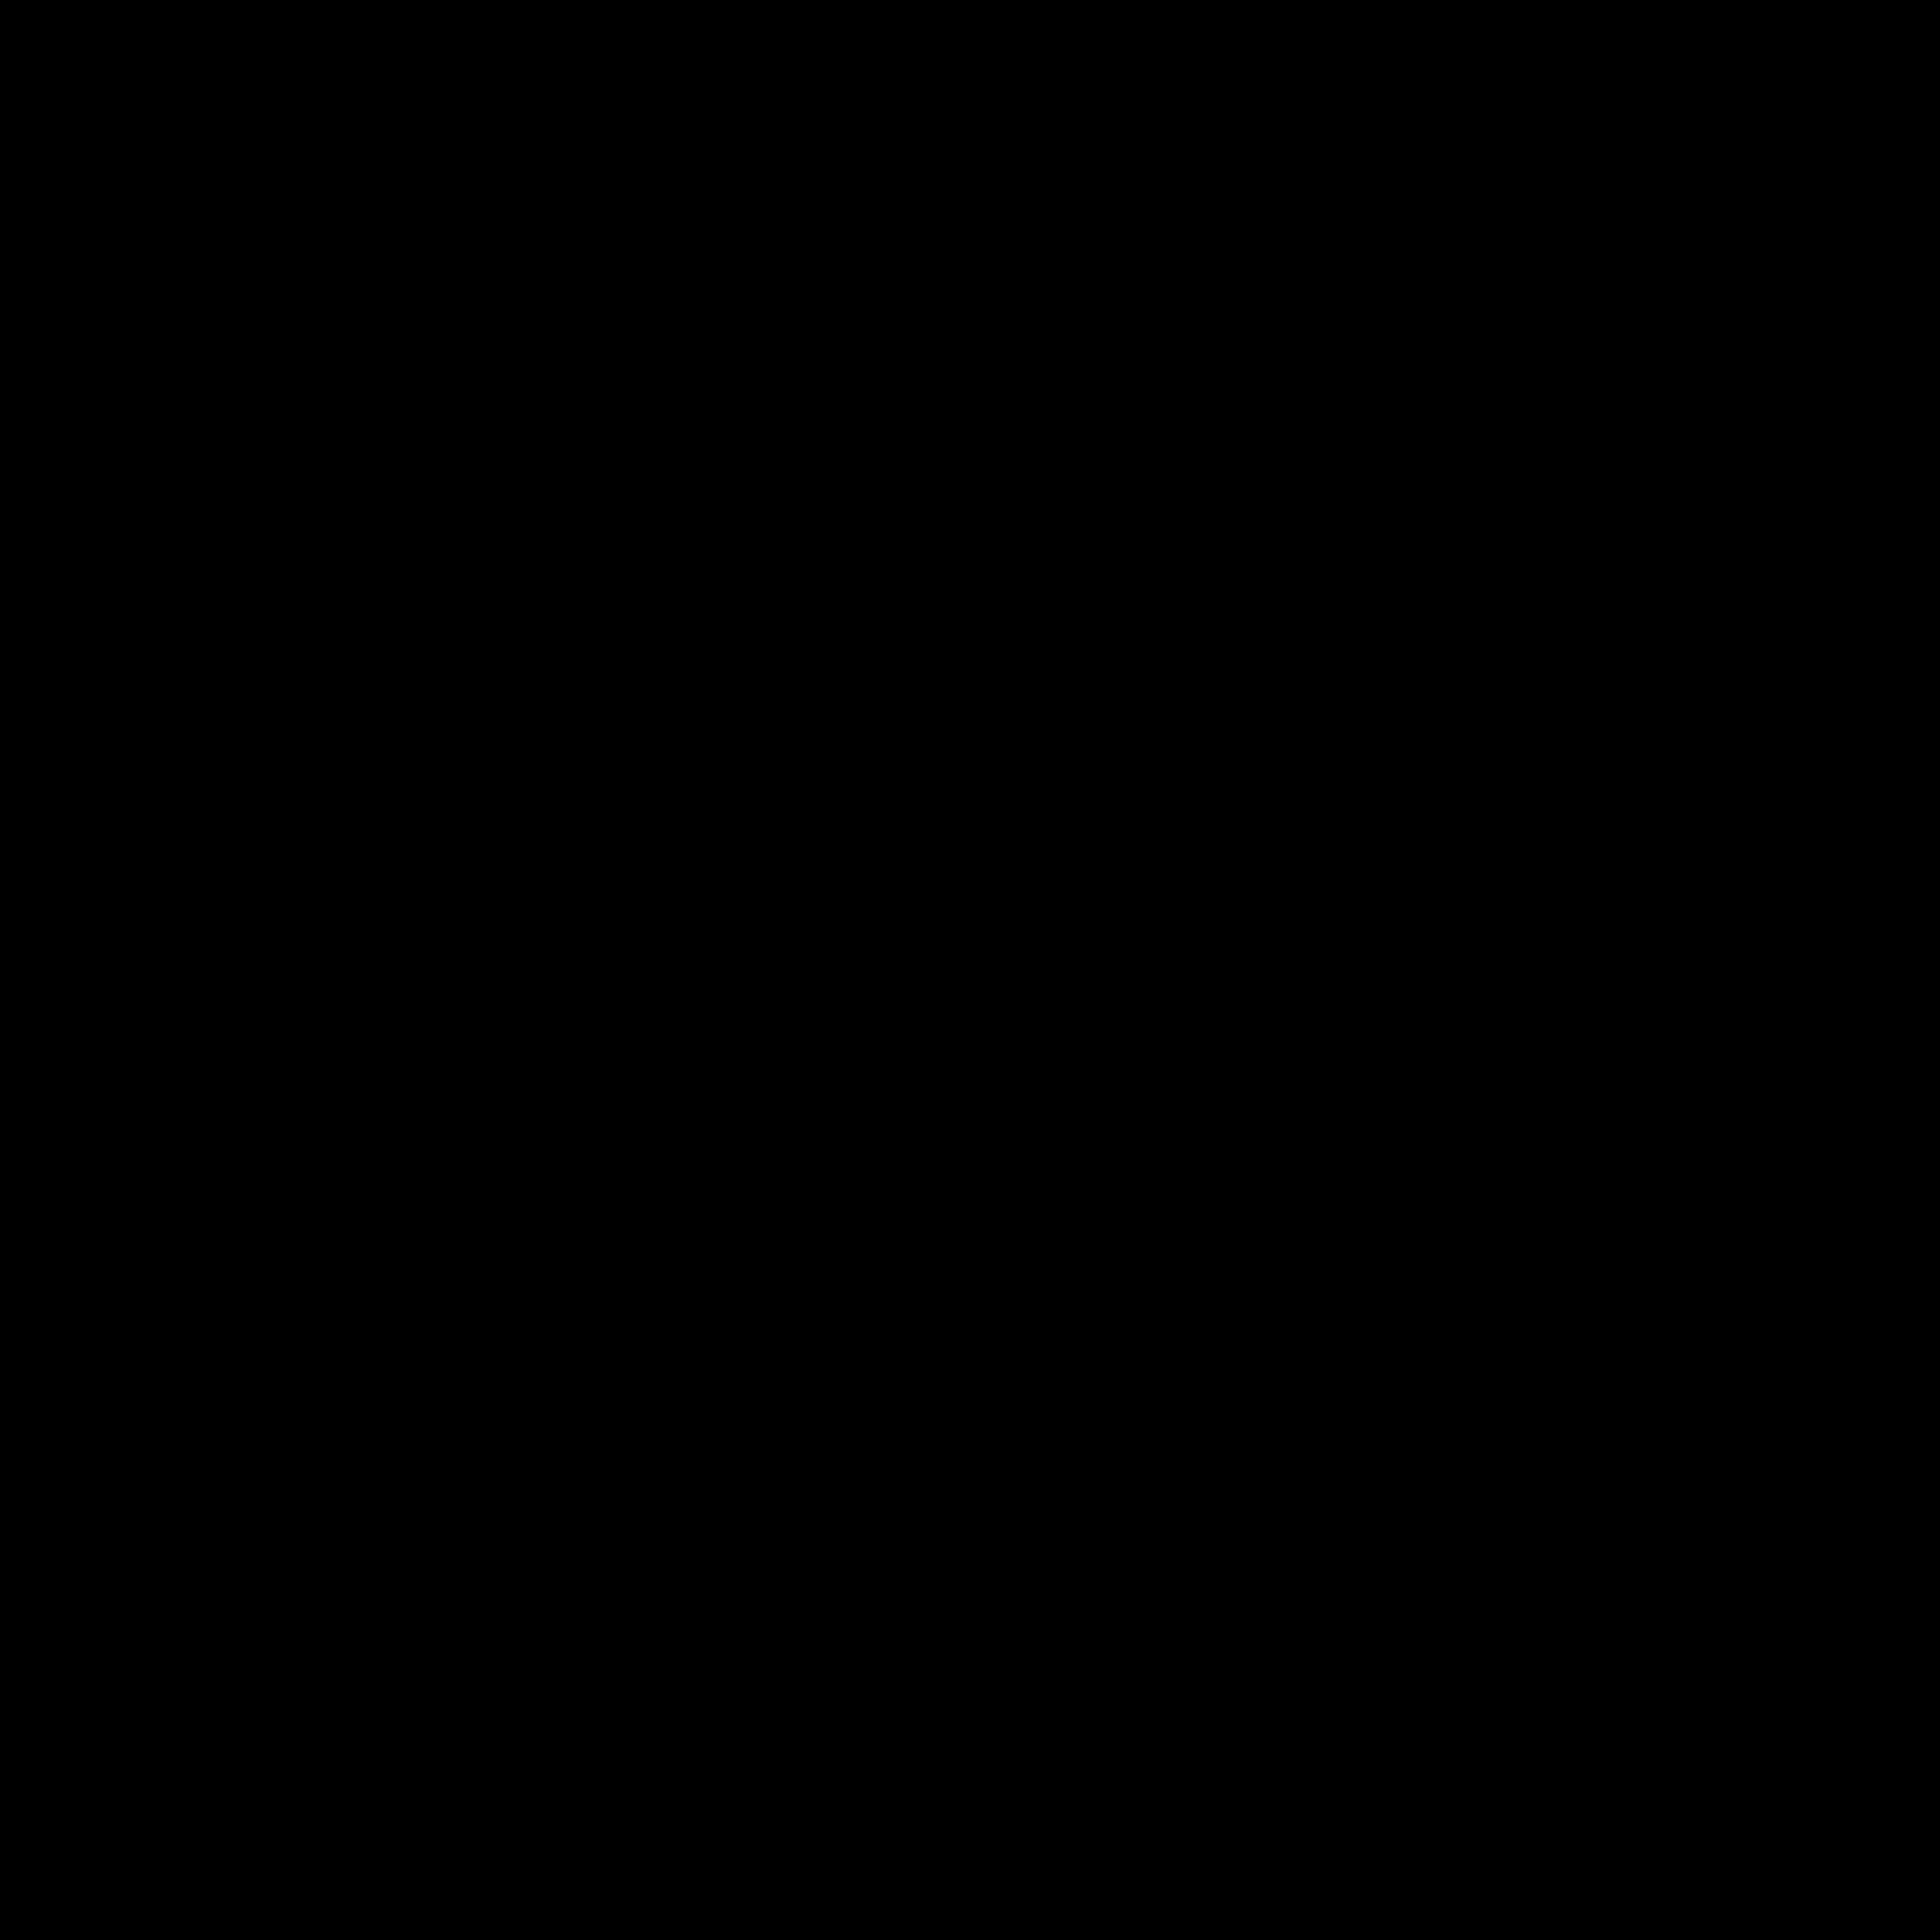 Tv icon x big. Clipart camera outline